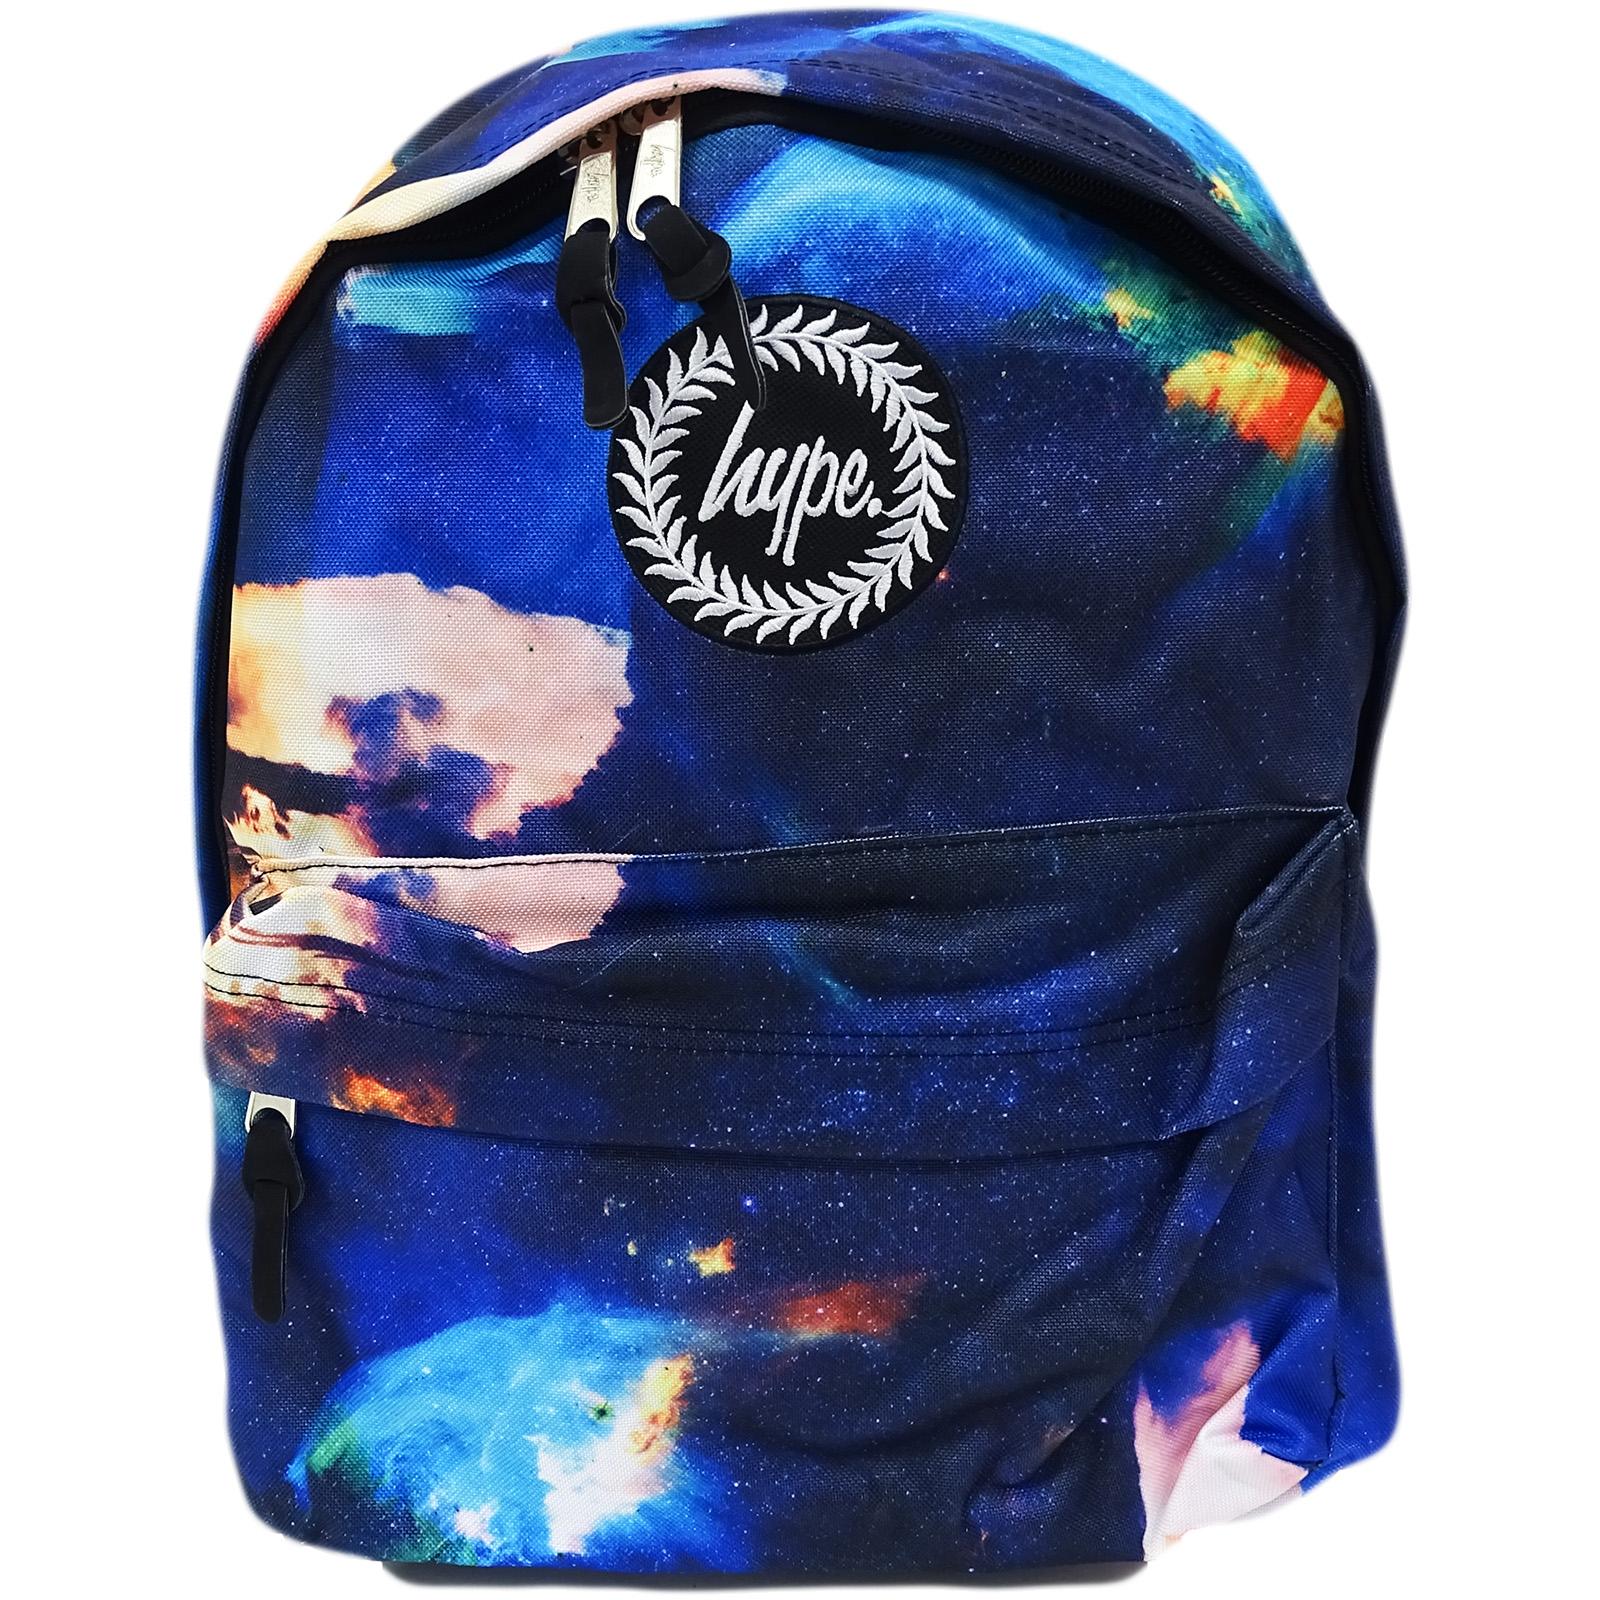 Hype Space Backpack / Rucksack Bag Supernova